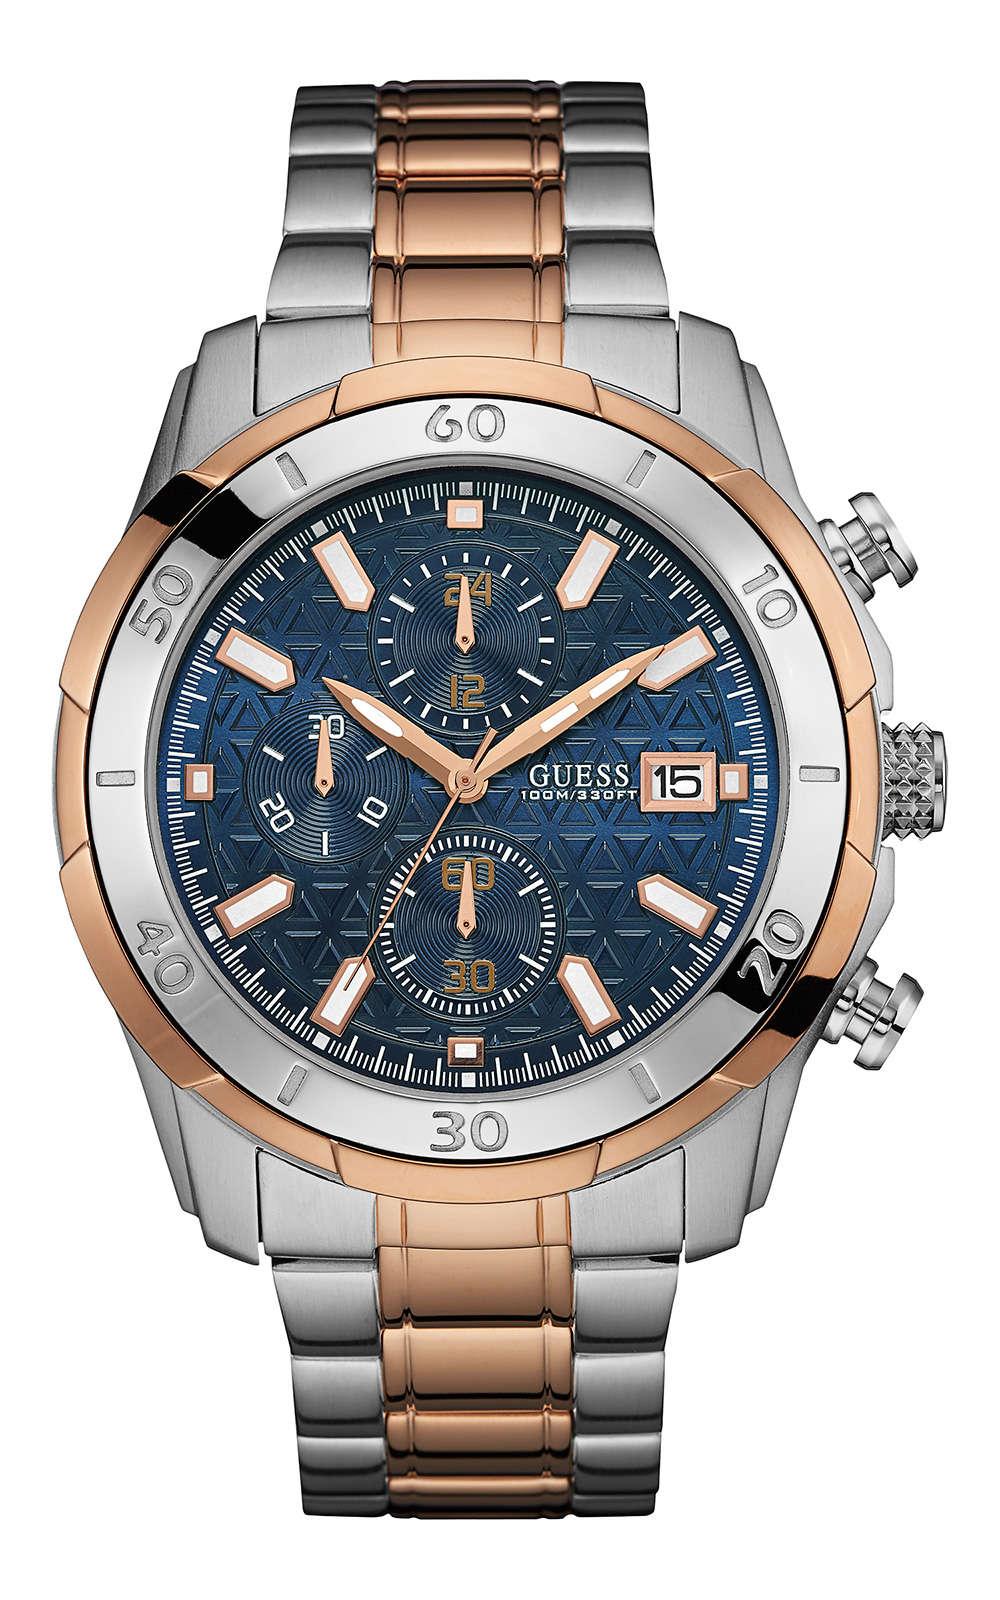 GUESS W0746G1 Ανδρικό Ρολόι Quartz Χρονογράφος Ακριβείας 75793e48ae6